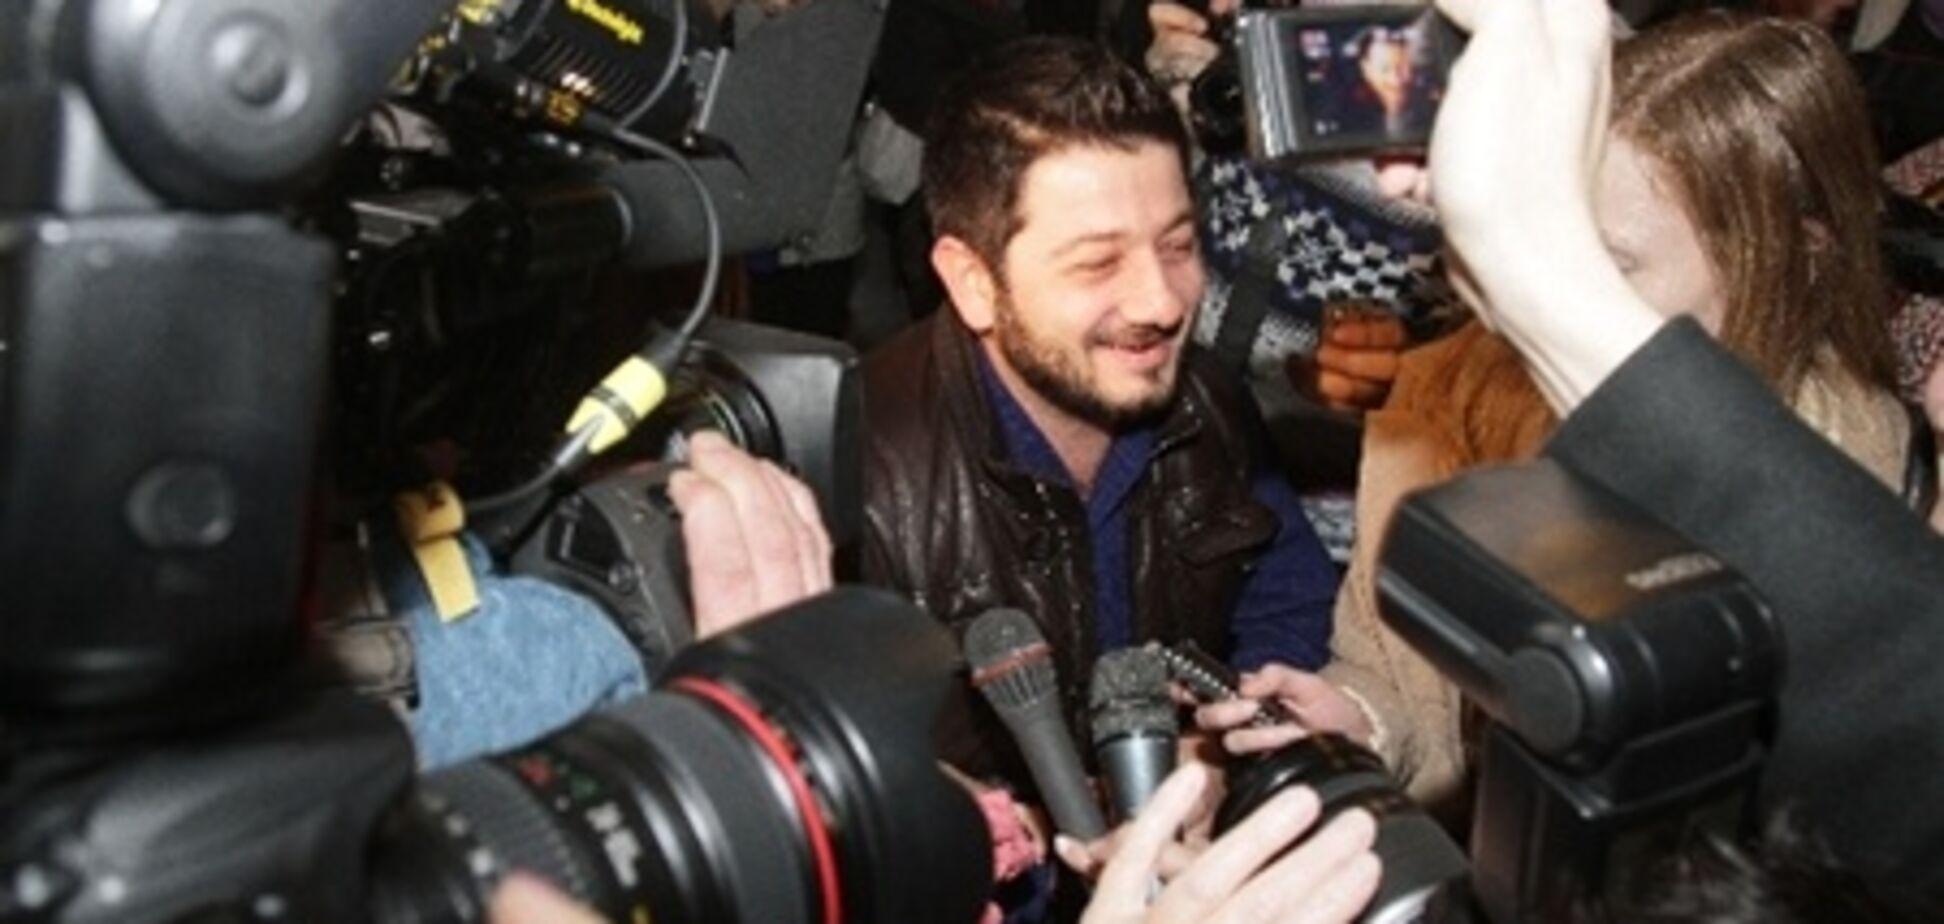 Журналисты едва не задушили Галустяна. Фото